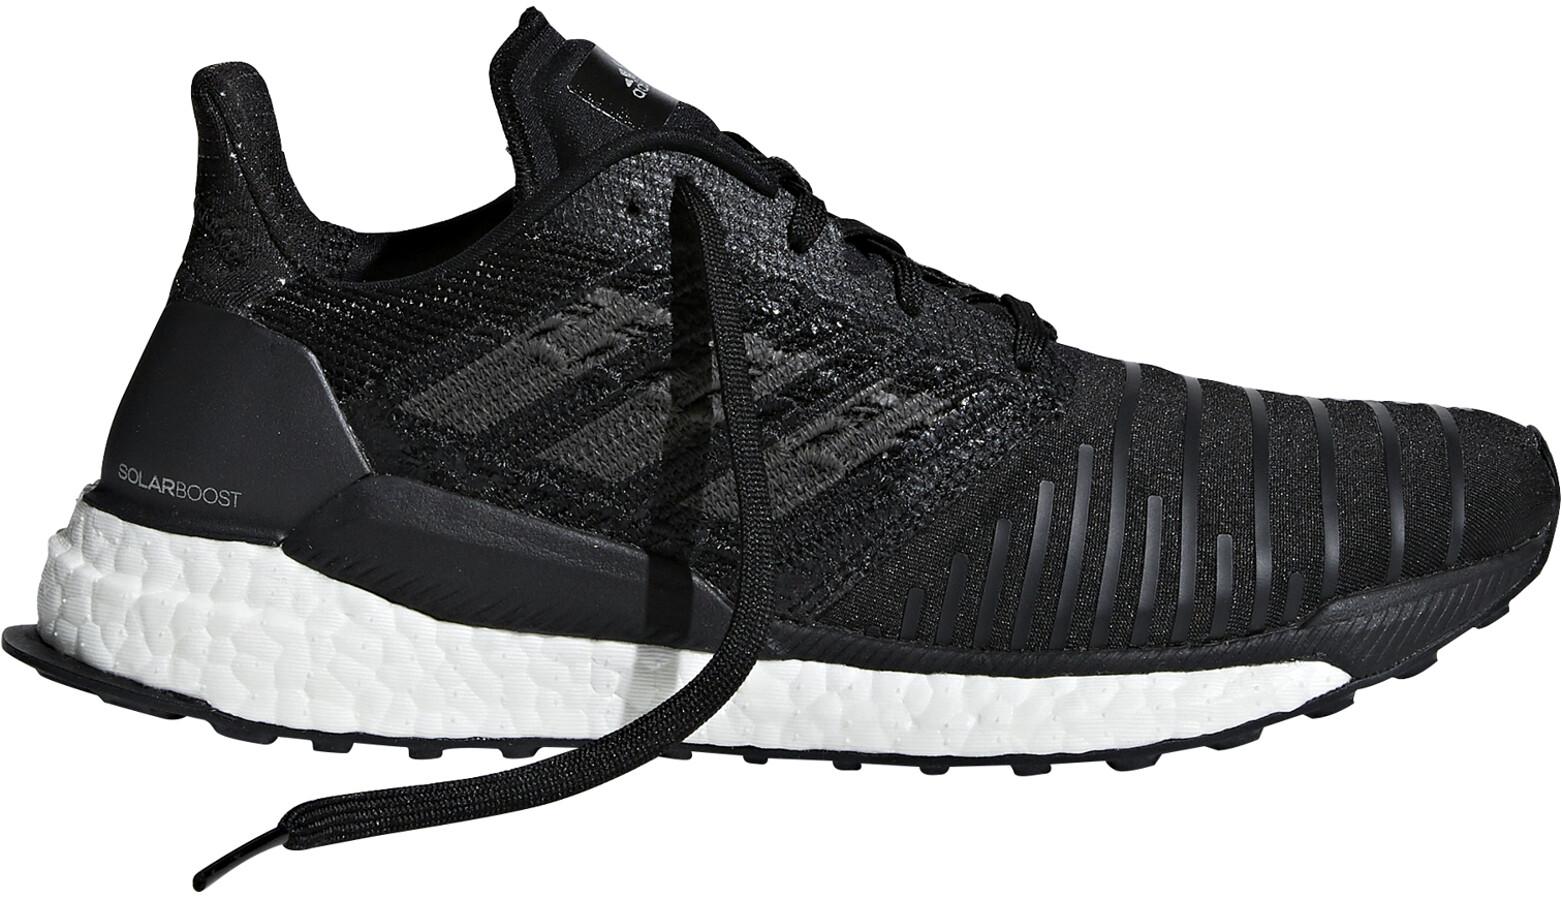 c72d5df22f74 adidas Solar Boost Running Shoes Women black at Bikester.co.uk